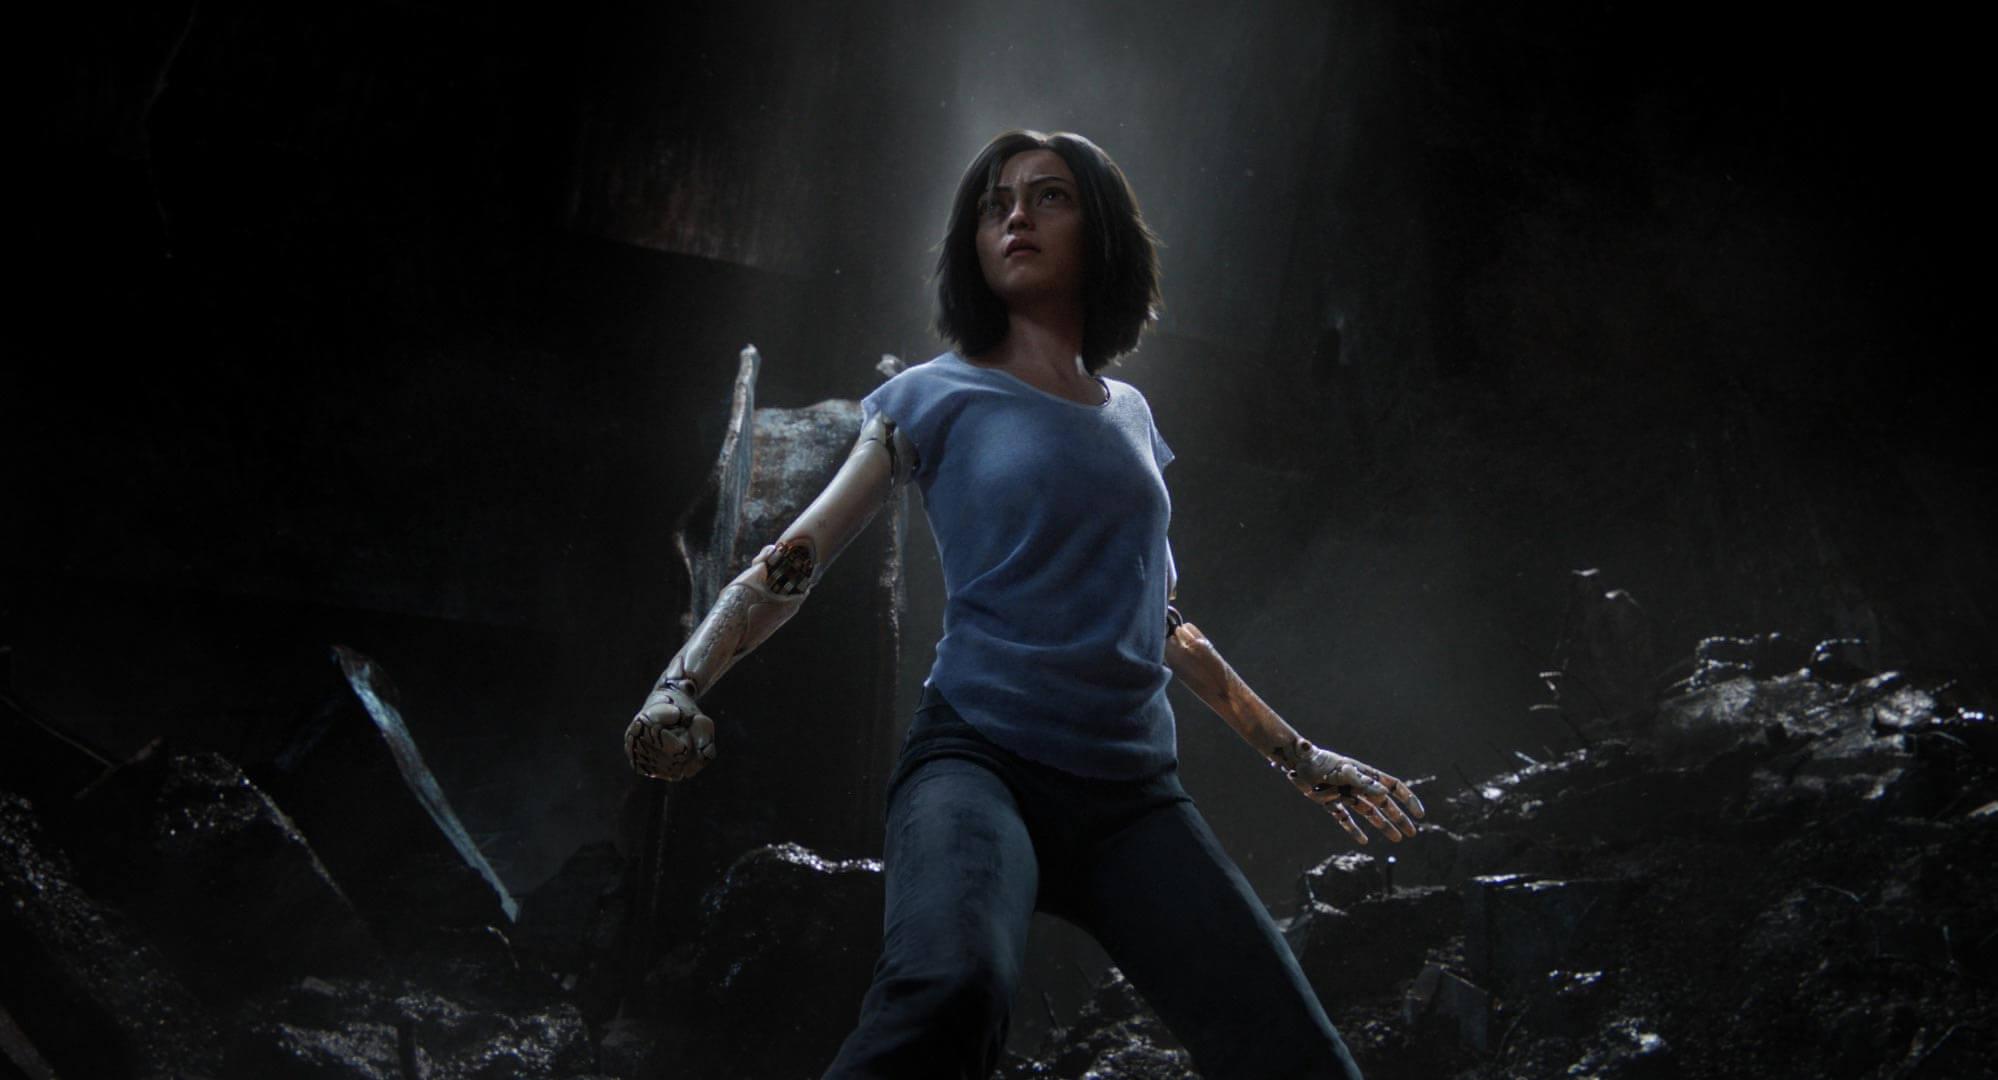 James Cameron Takes On Manga With Cyberpunk Actioner  'Alita: Battle Angel'